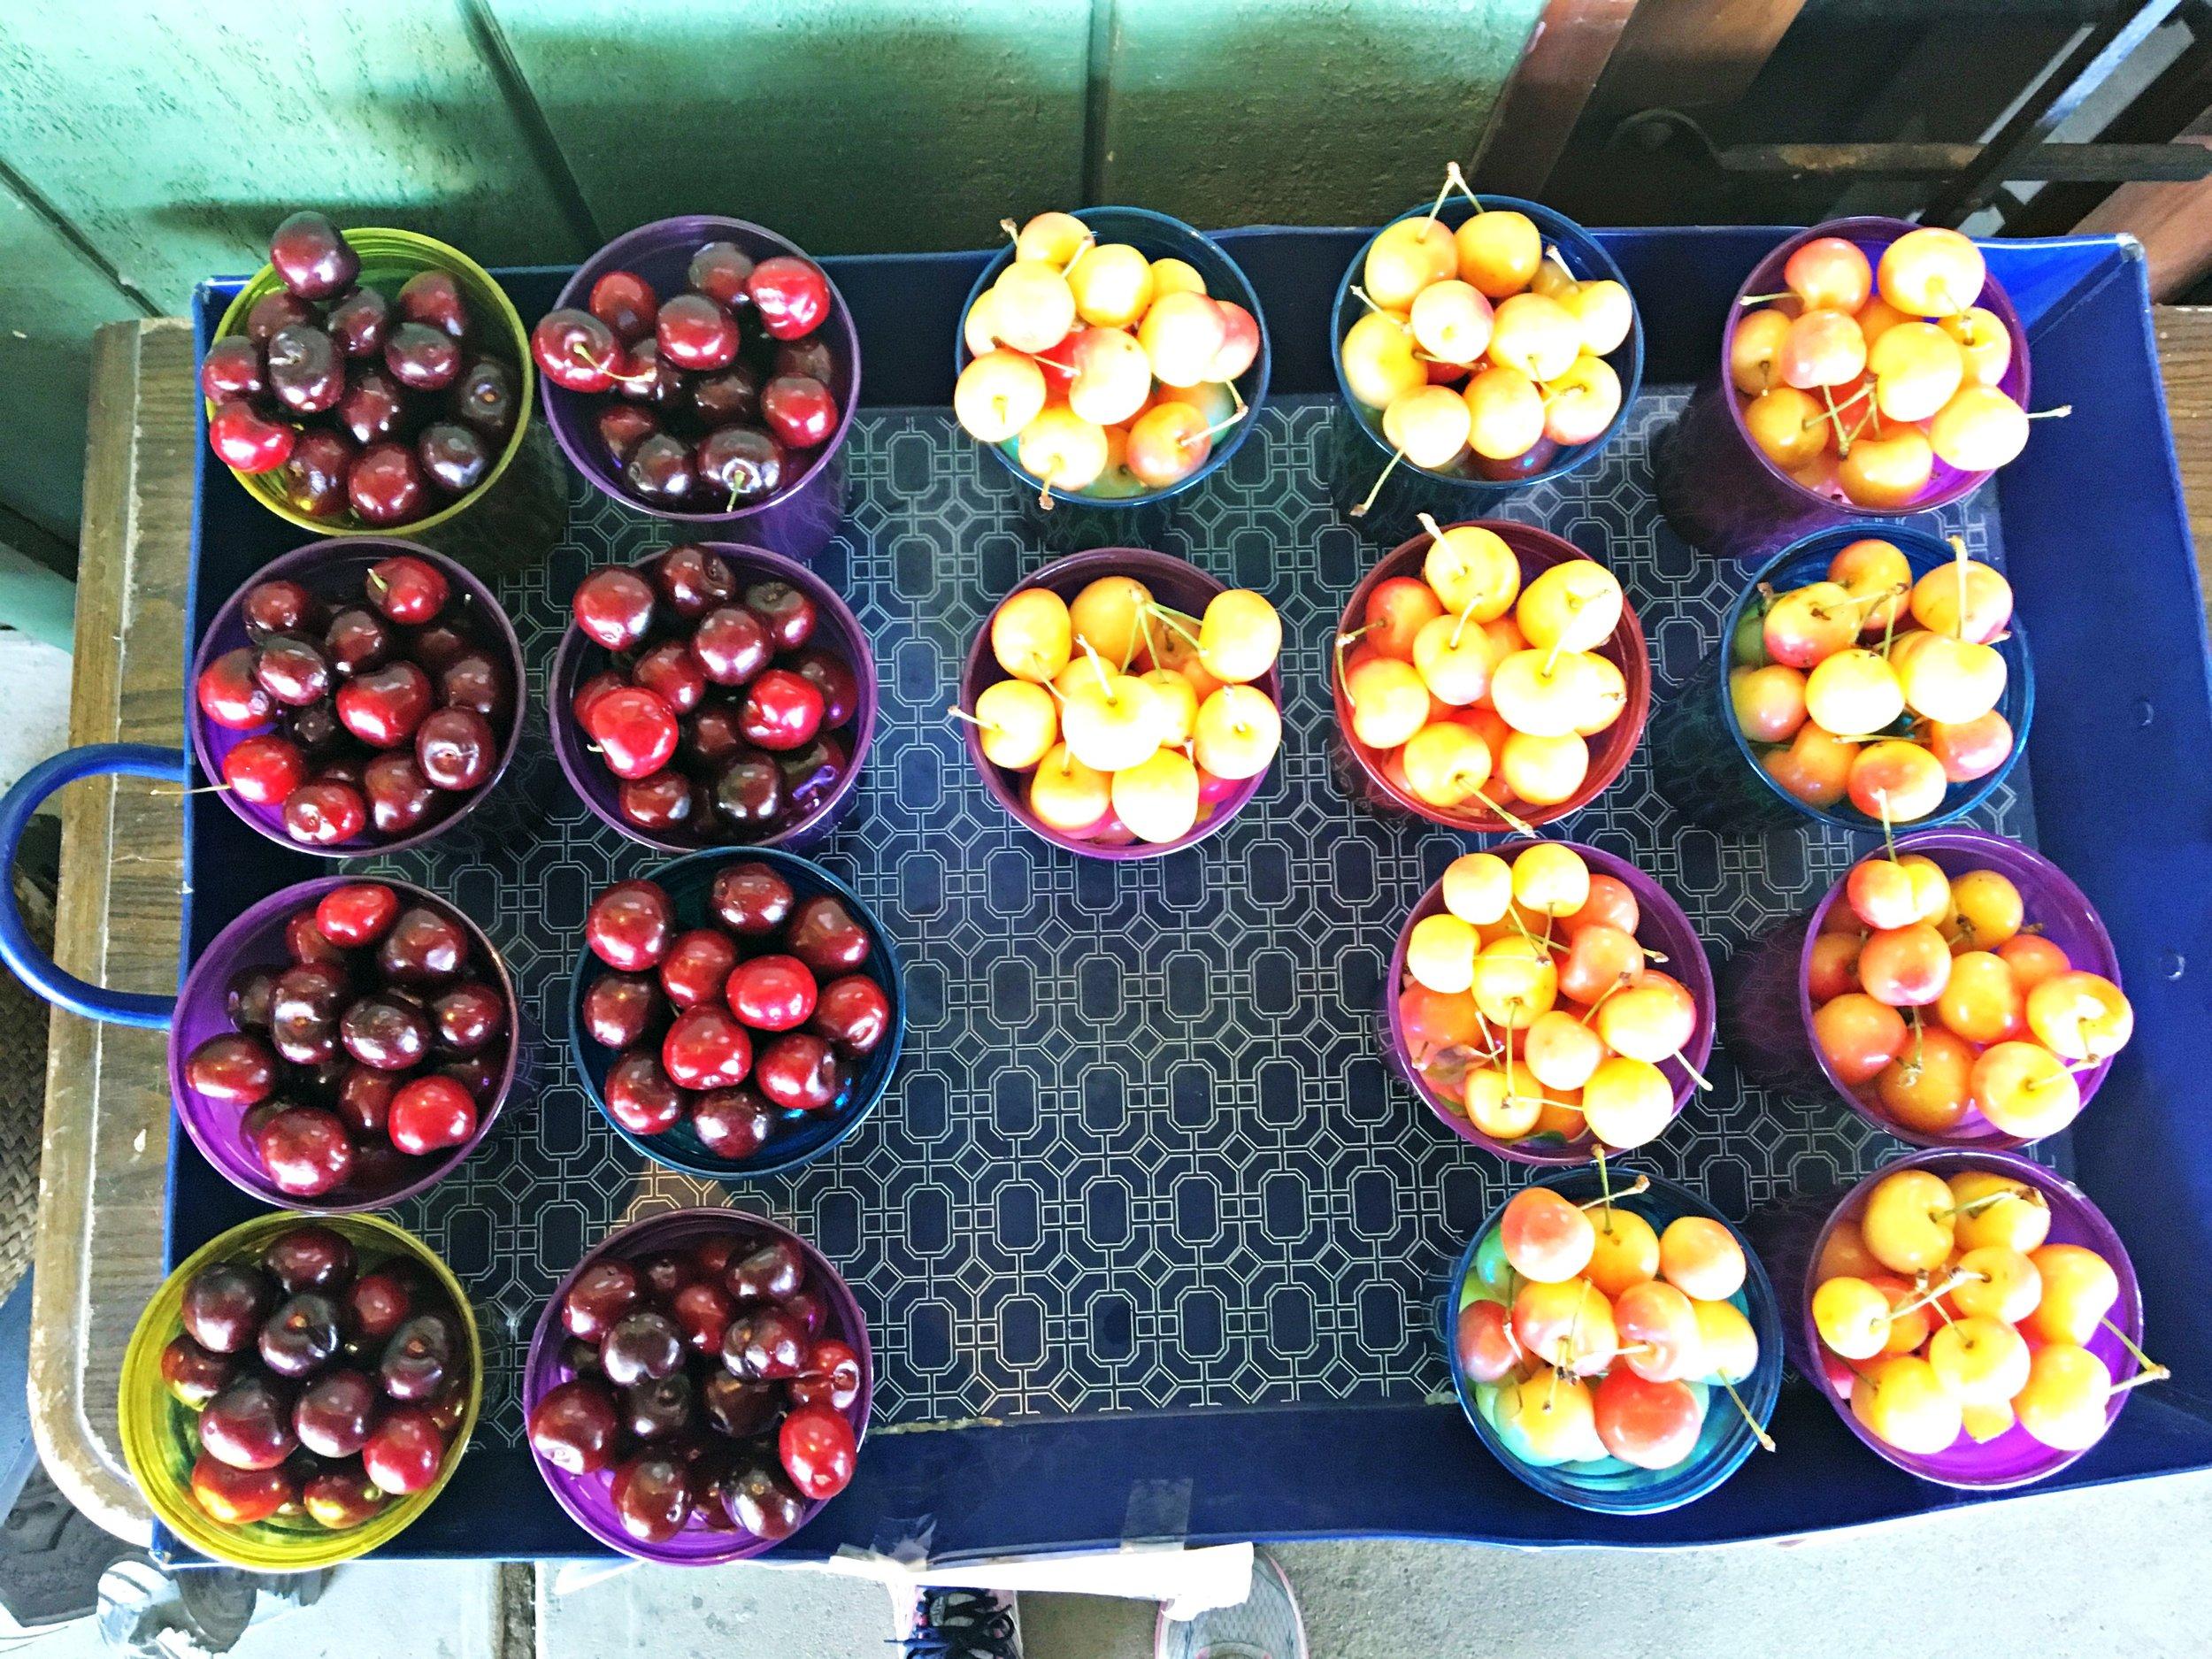 road-side-fruit-stand-california-cherries